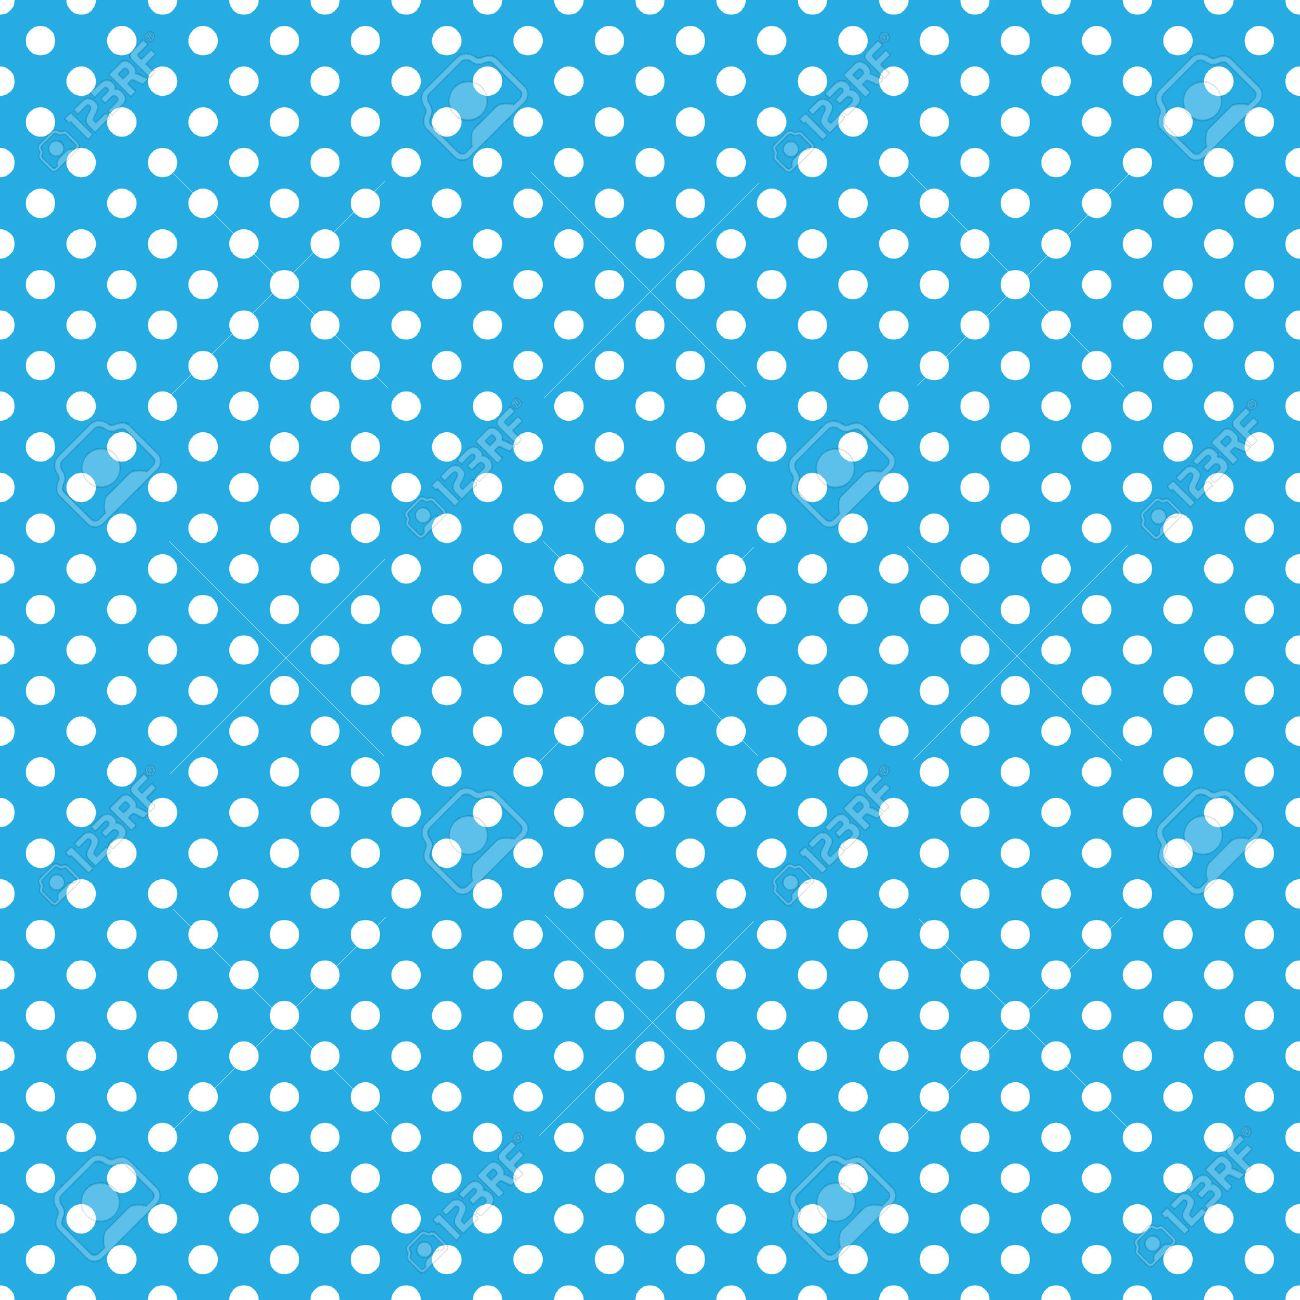 Seamless Blue Polka Dot Background Royalty Free Cliparts Vectors